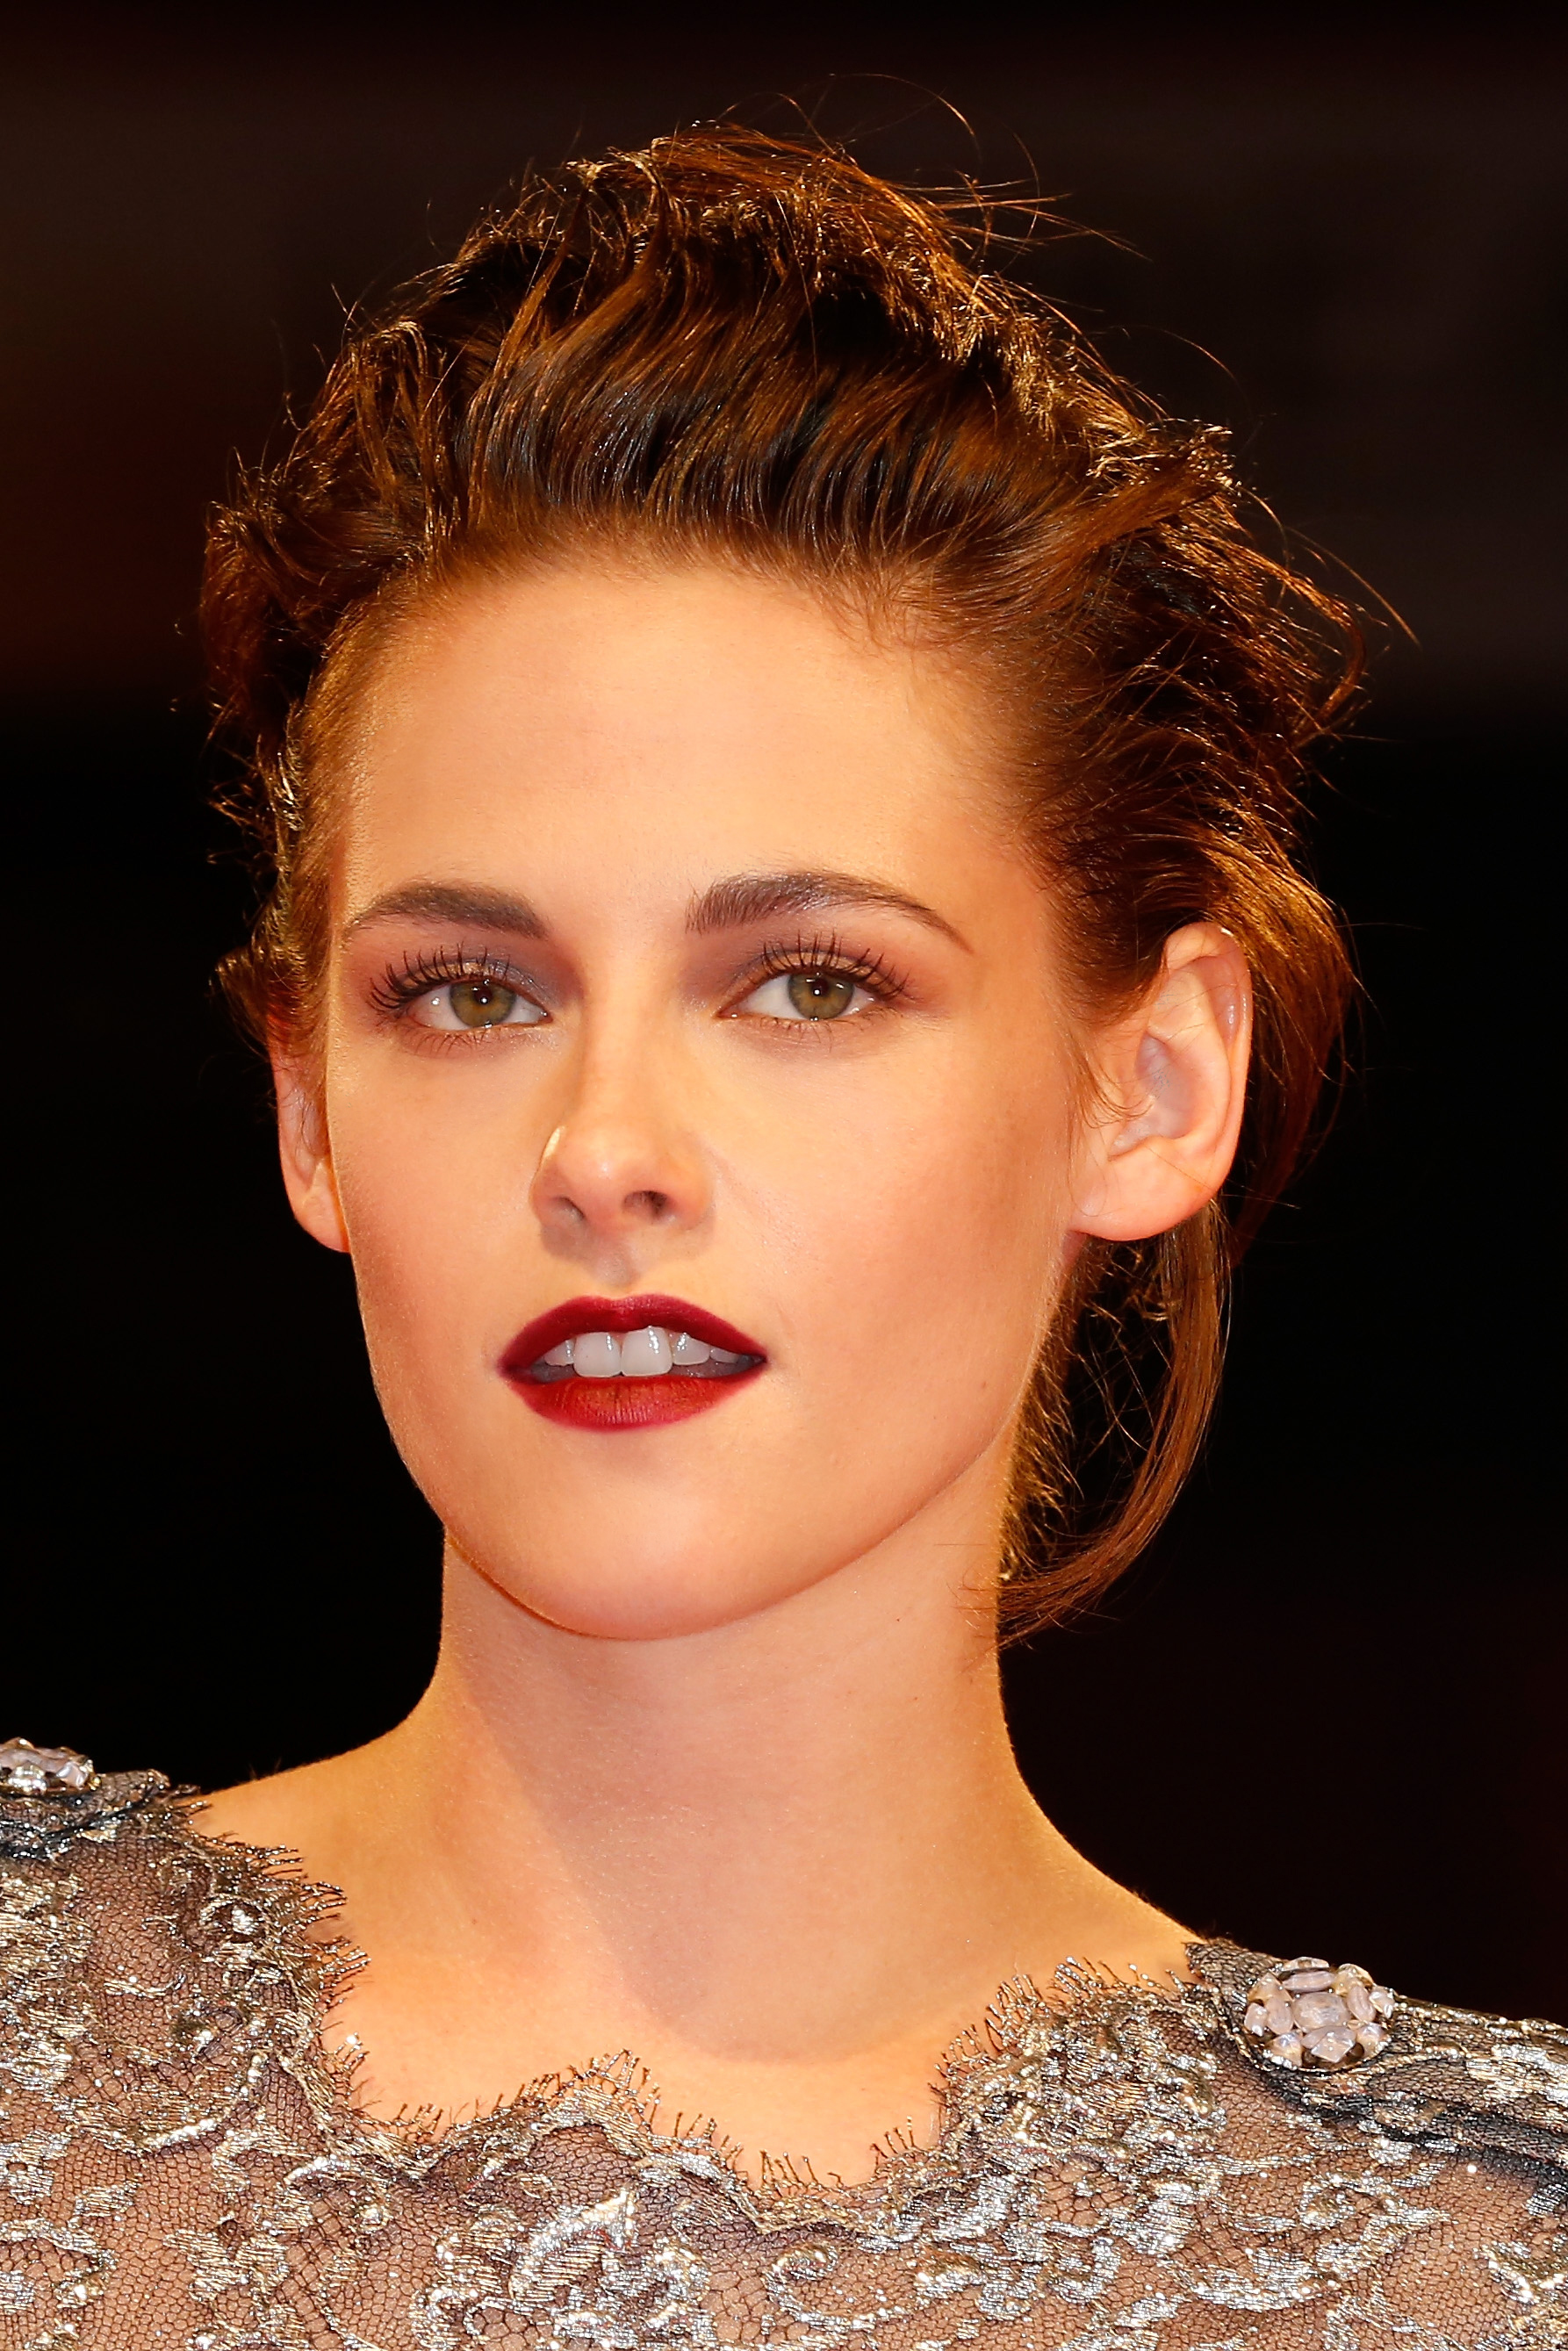 KRISTEN STEWART FOR CHANEL AT VENICE FILM FESTIVAL - CRASH ... Kristen Stewart